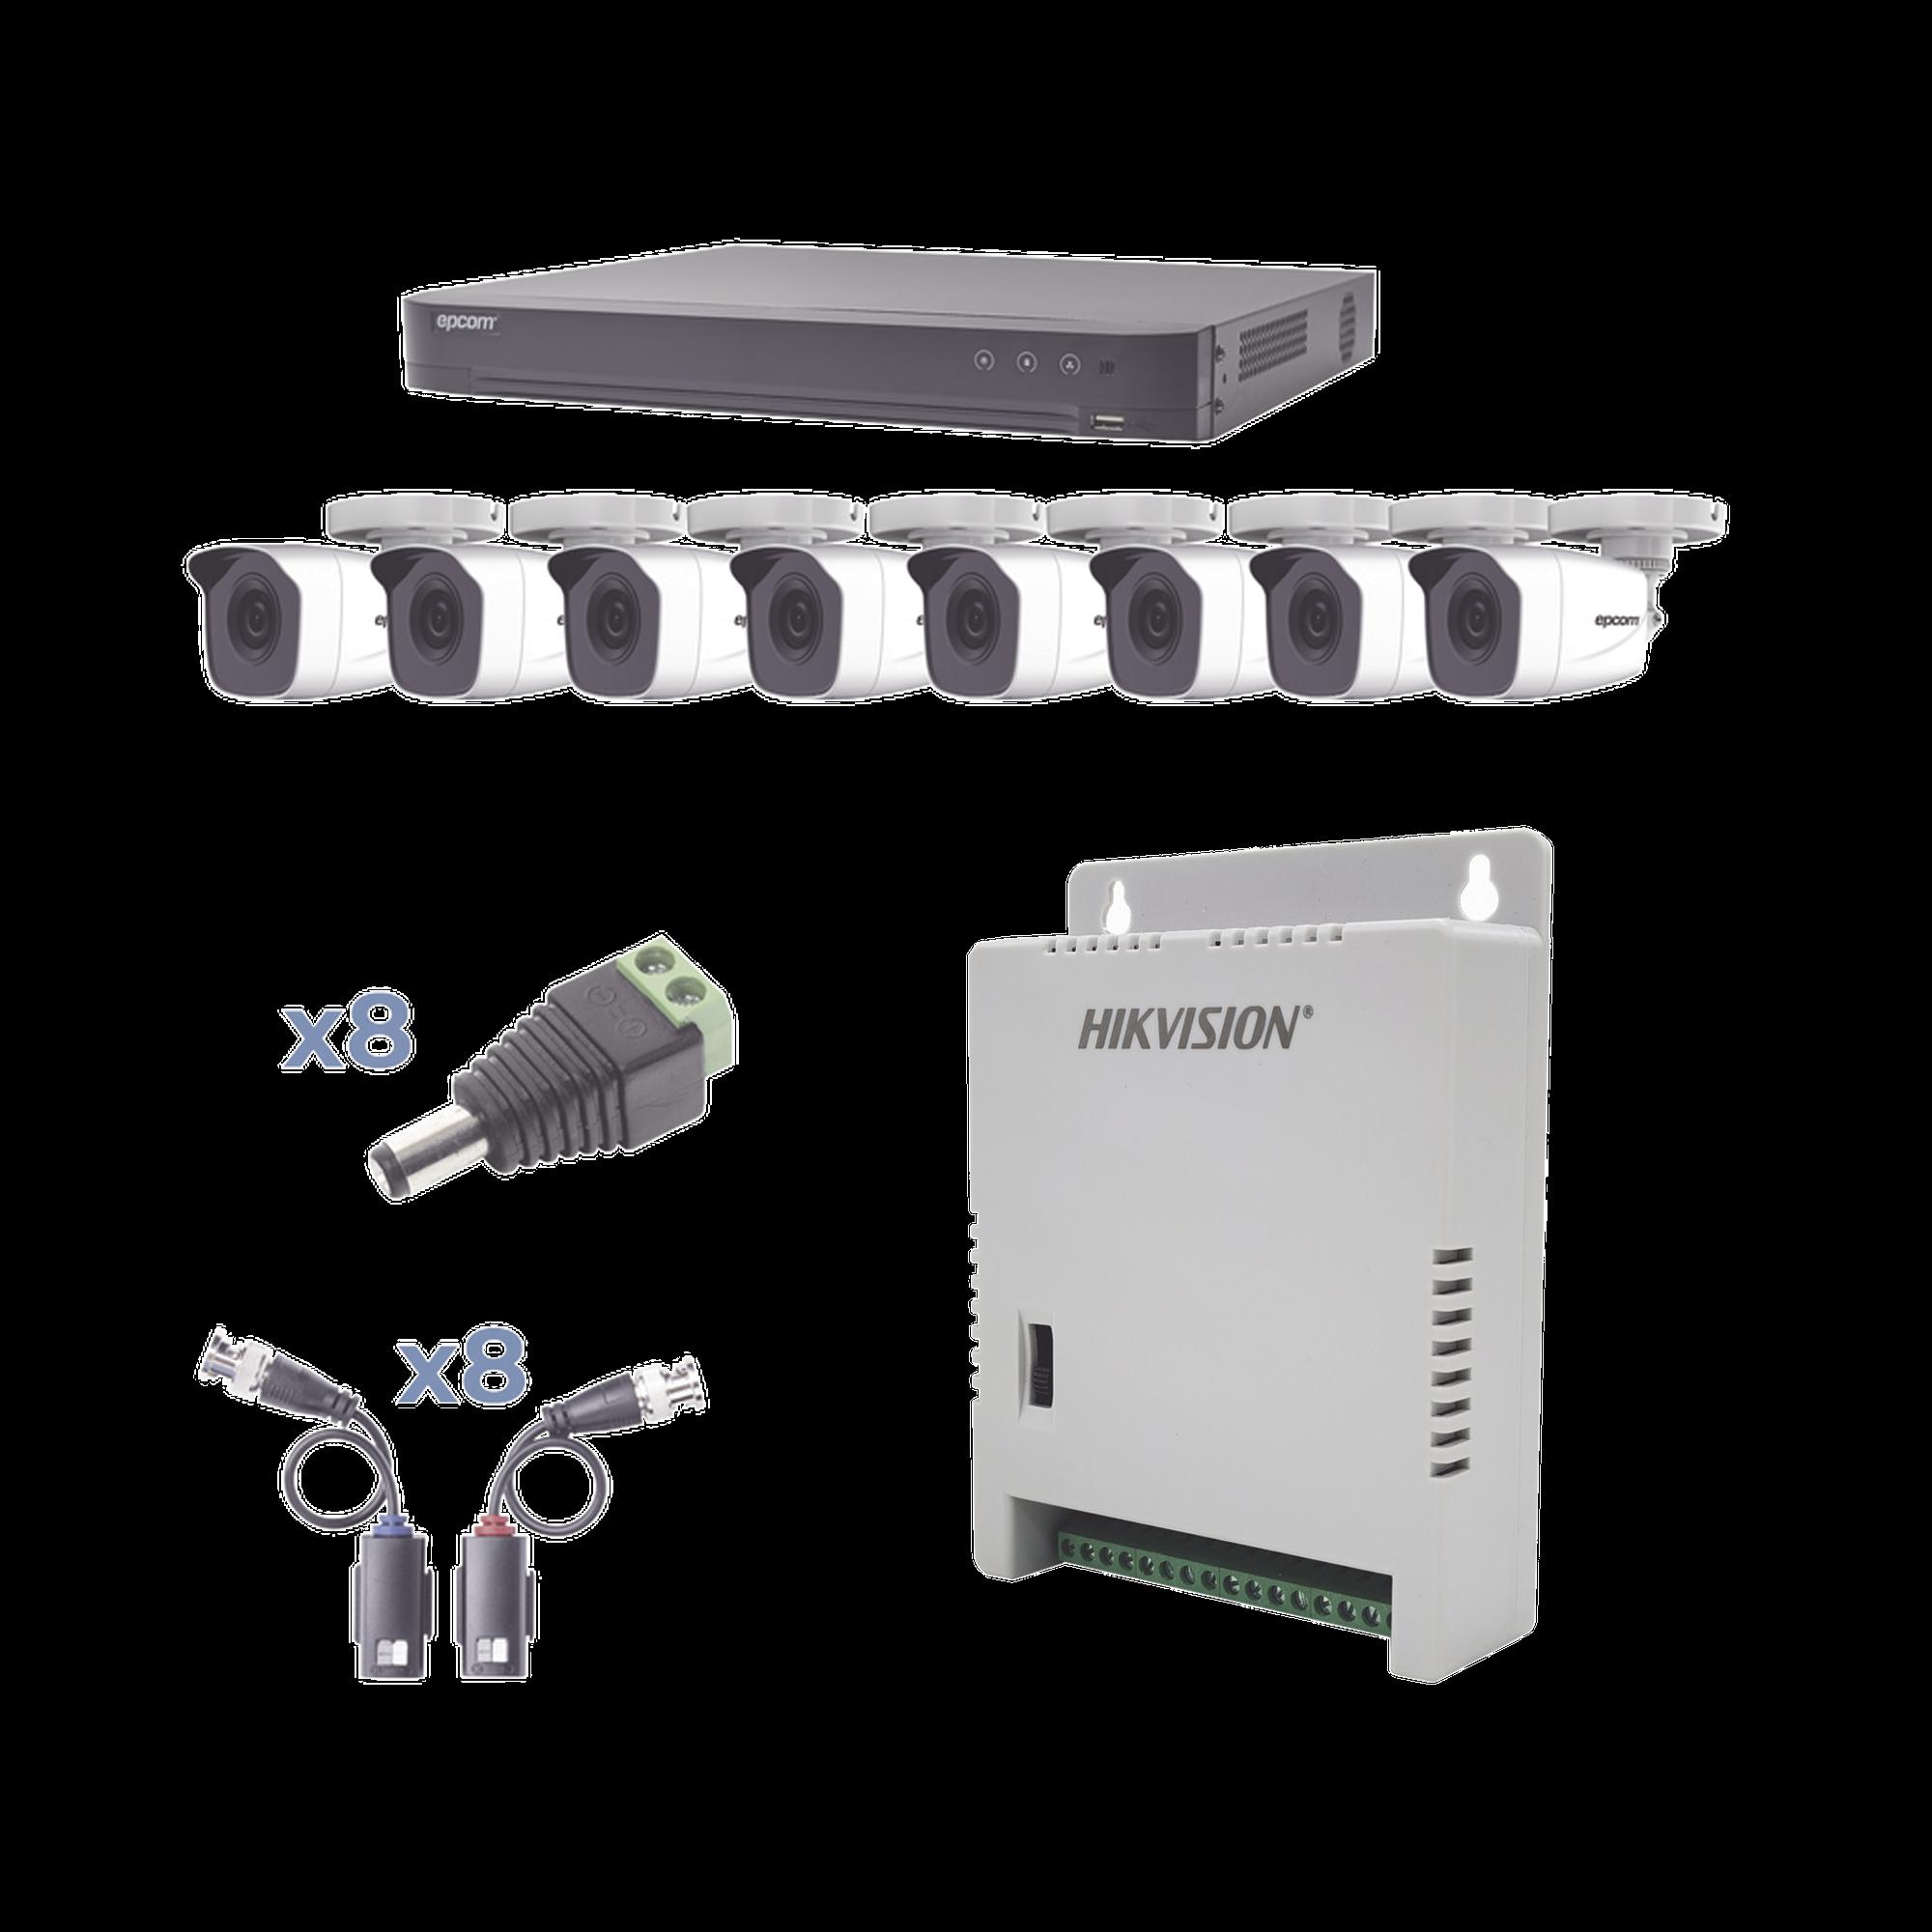 KIT TurboHD 1080p / DVR 8 Canales / 8 Cámaras Bala (exterior 2.8 mm) / Transceptores / Conectores / Fuente de Poder Profesional hasta 15 Vcd para Larga Distancias